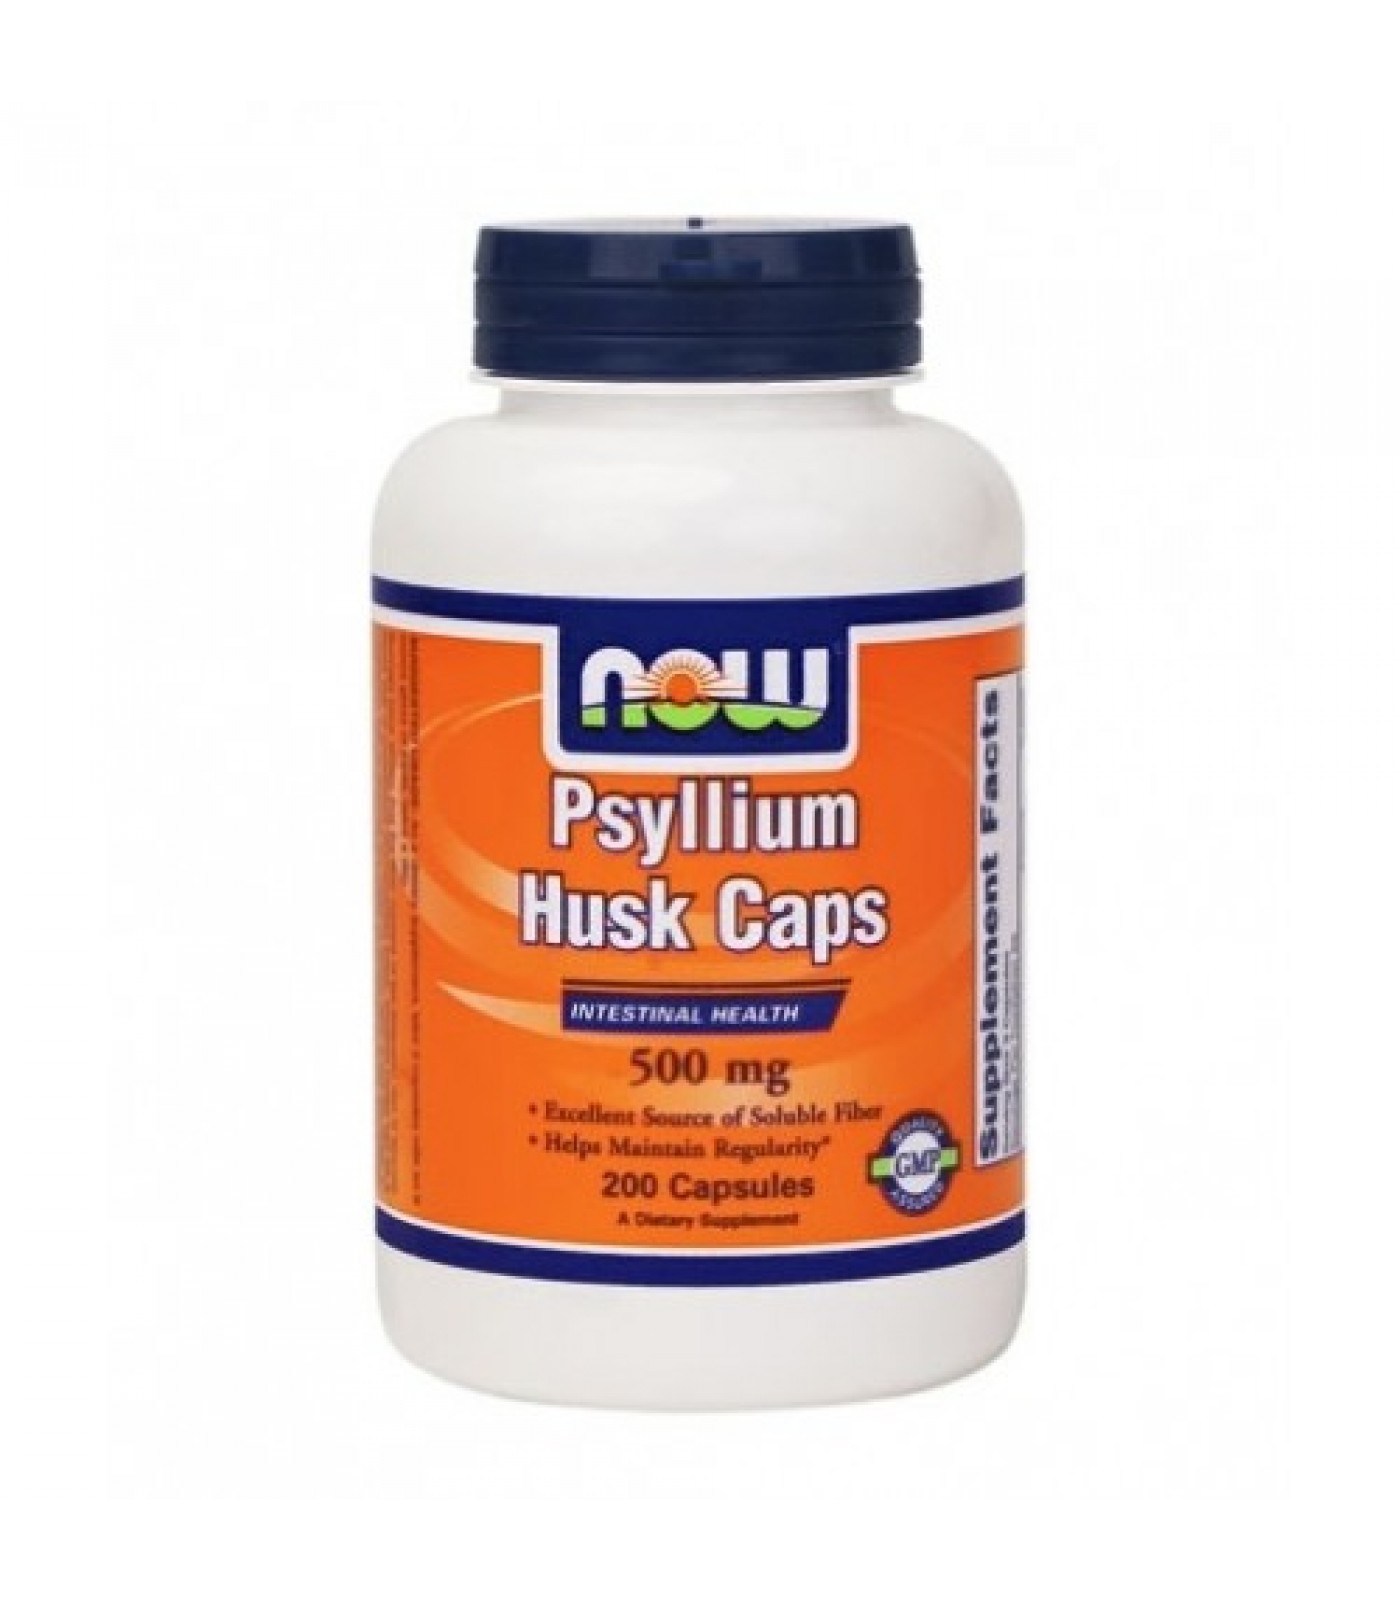 NOW - Psyllium Husk 500mg. / 200 Caps.